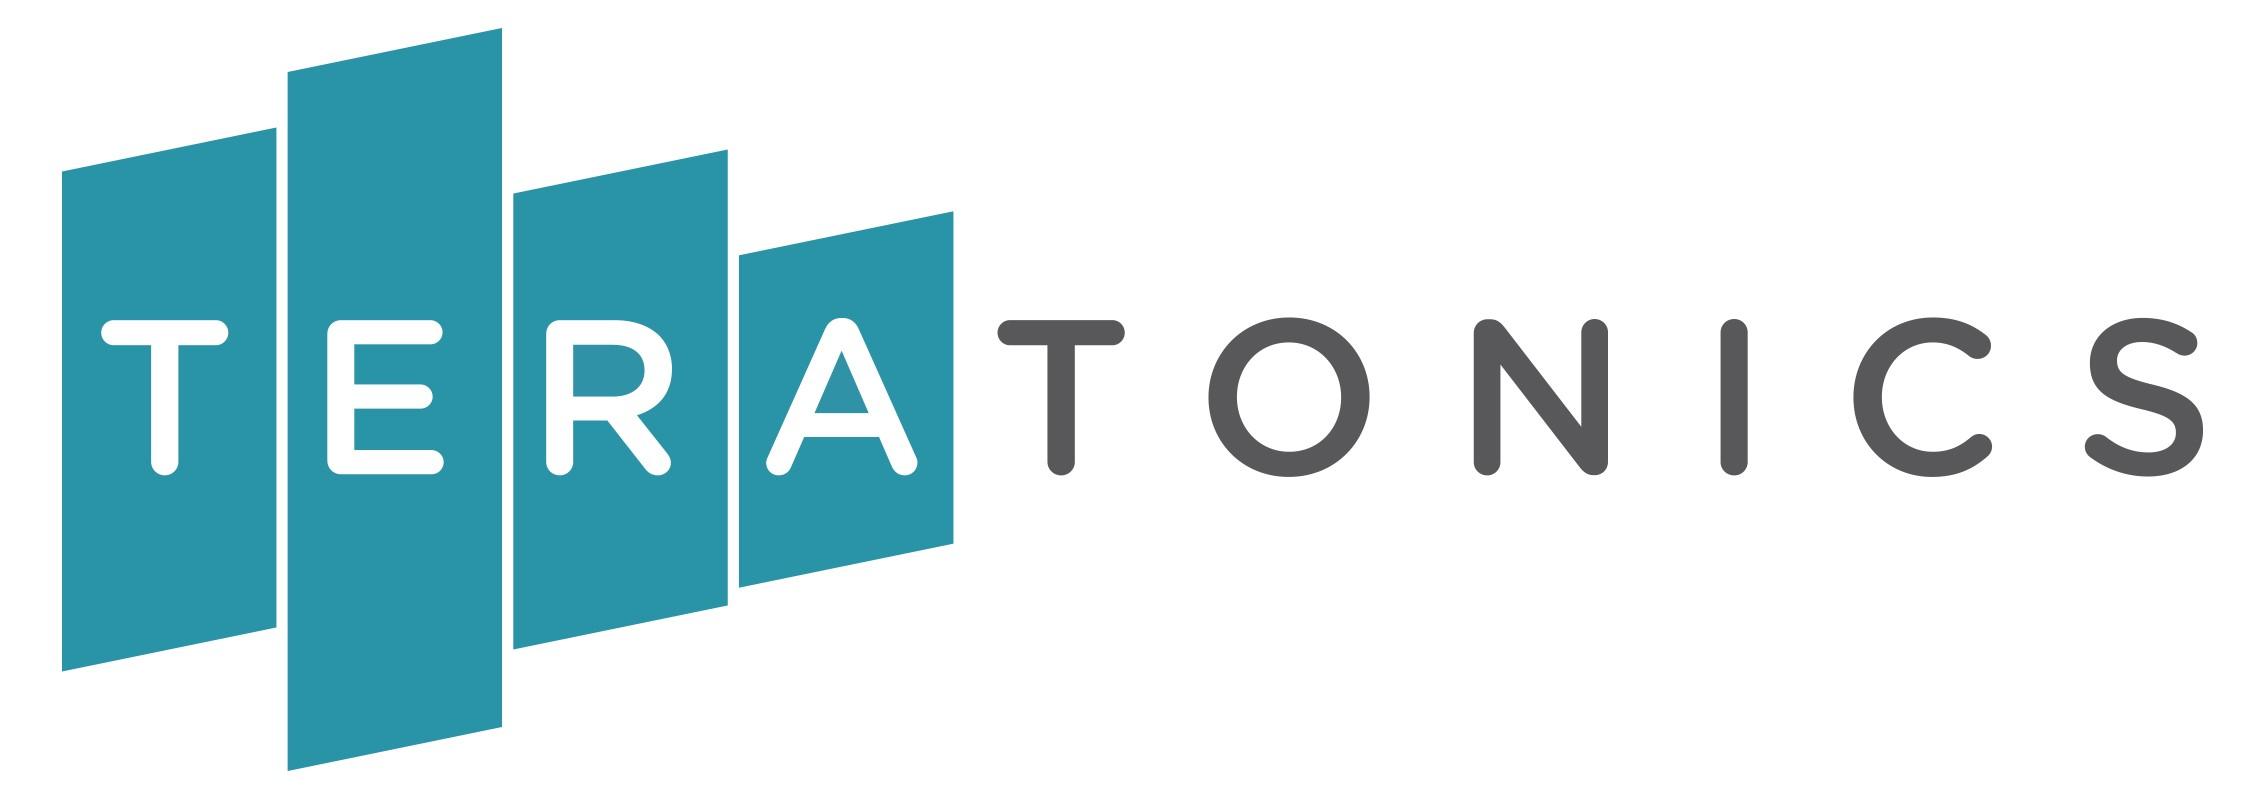 logo Teratonics